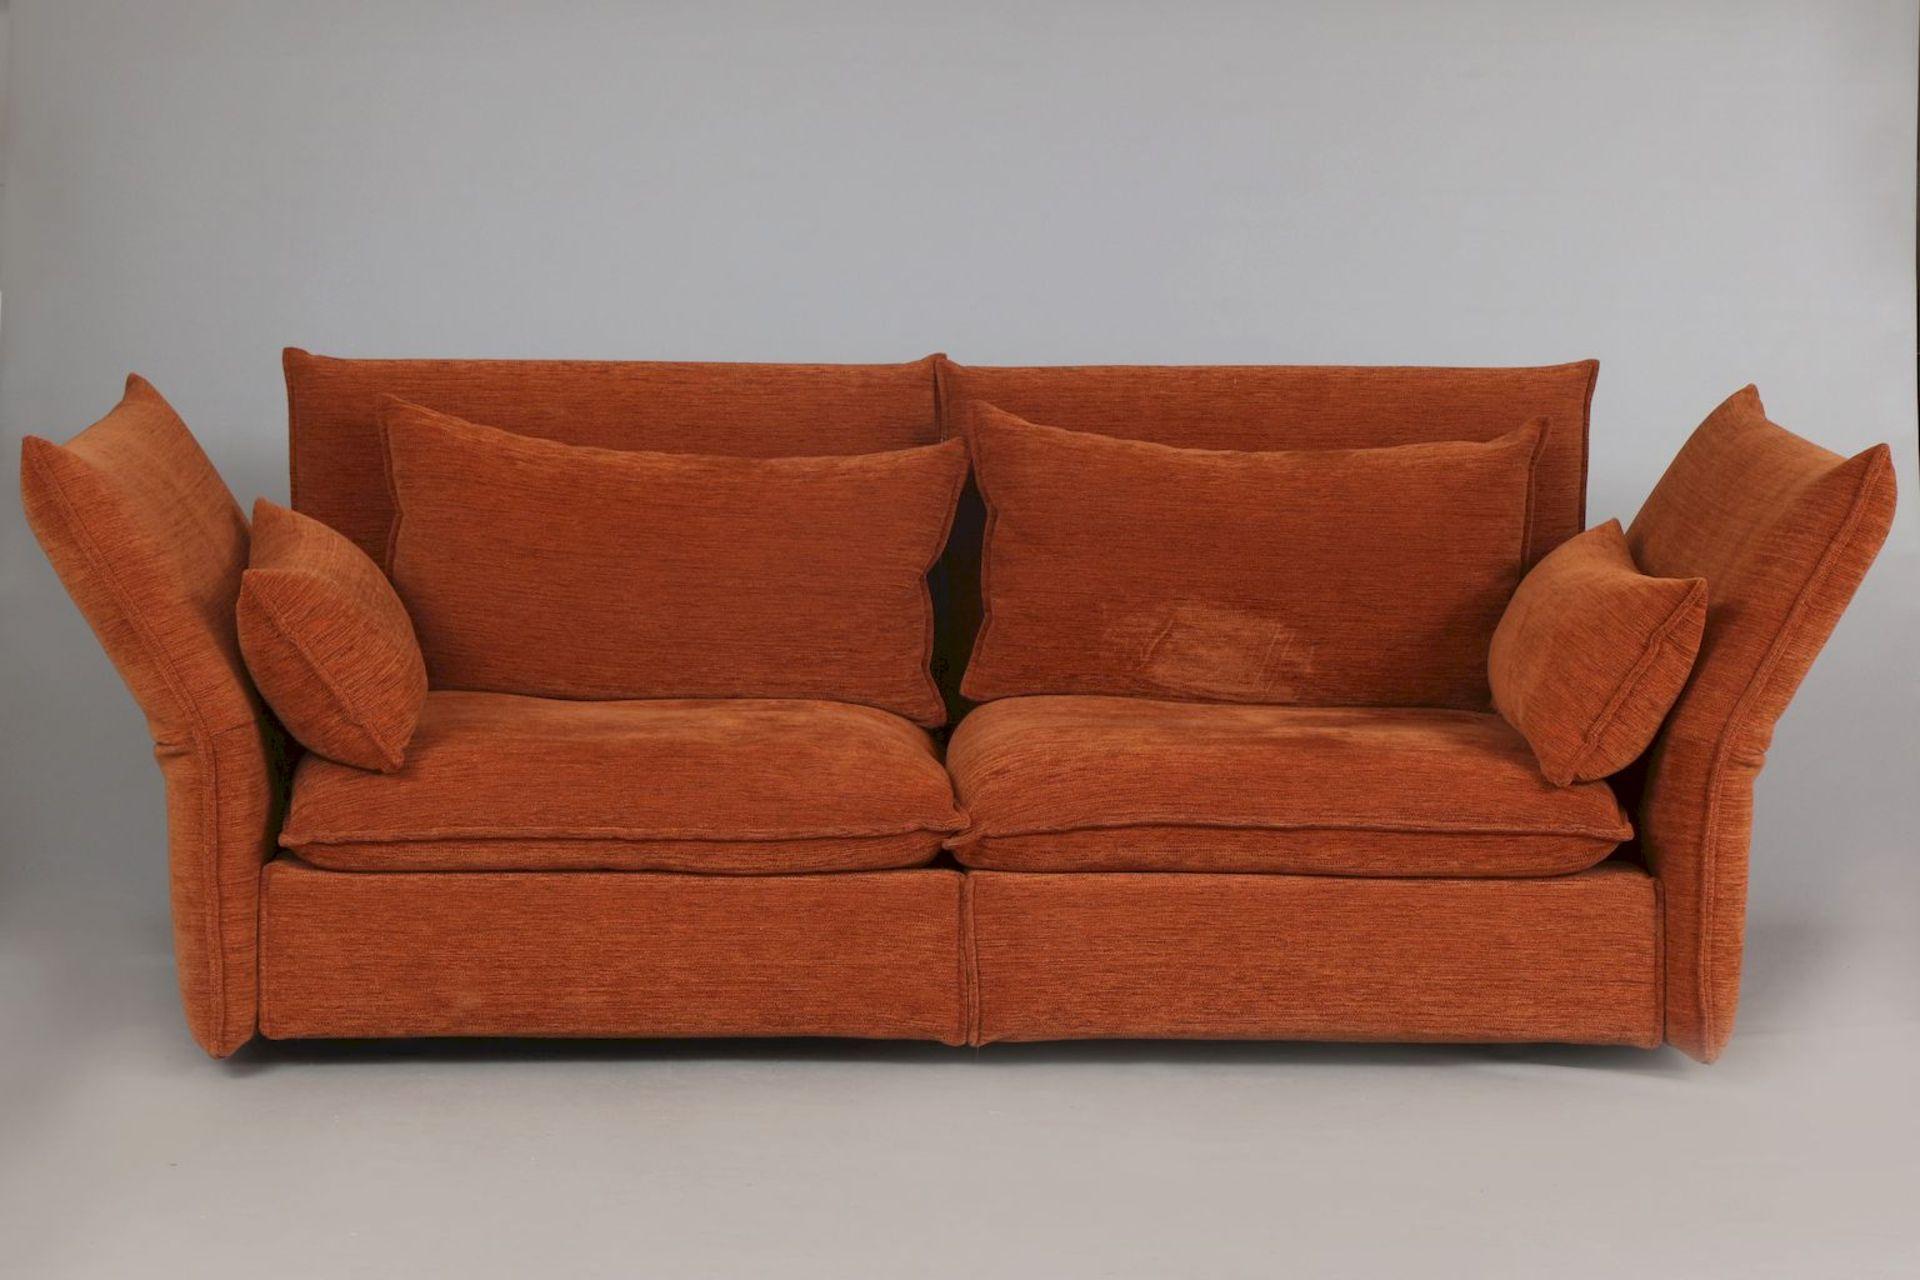 EDWARD BARBER & JAY OSGERBY Sofa ¨Mariposa¨ (2014) - Image 3 of 6